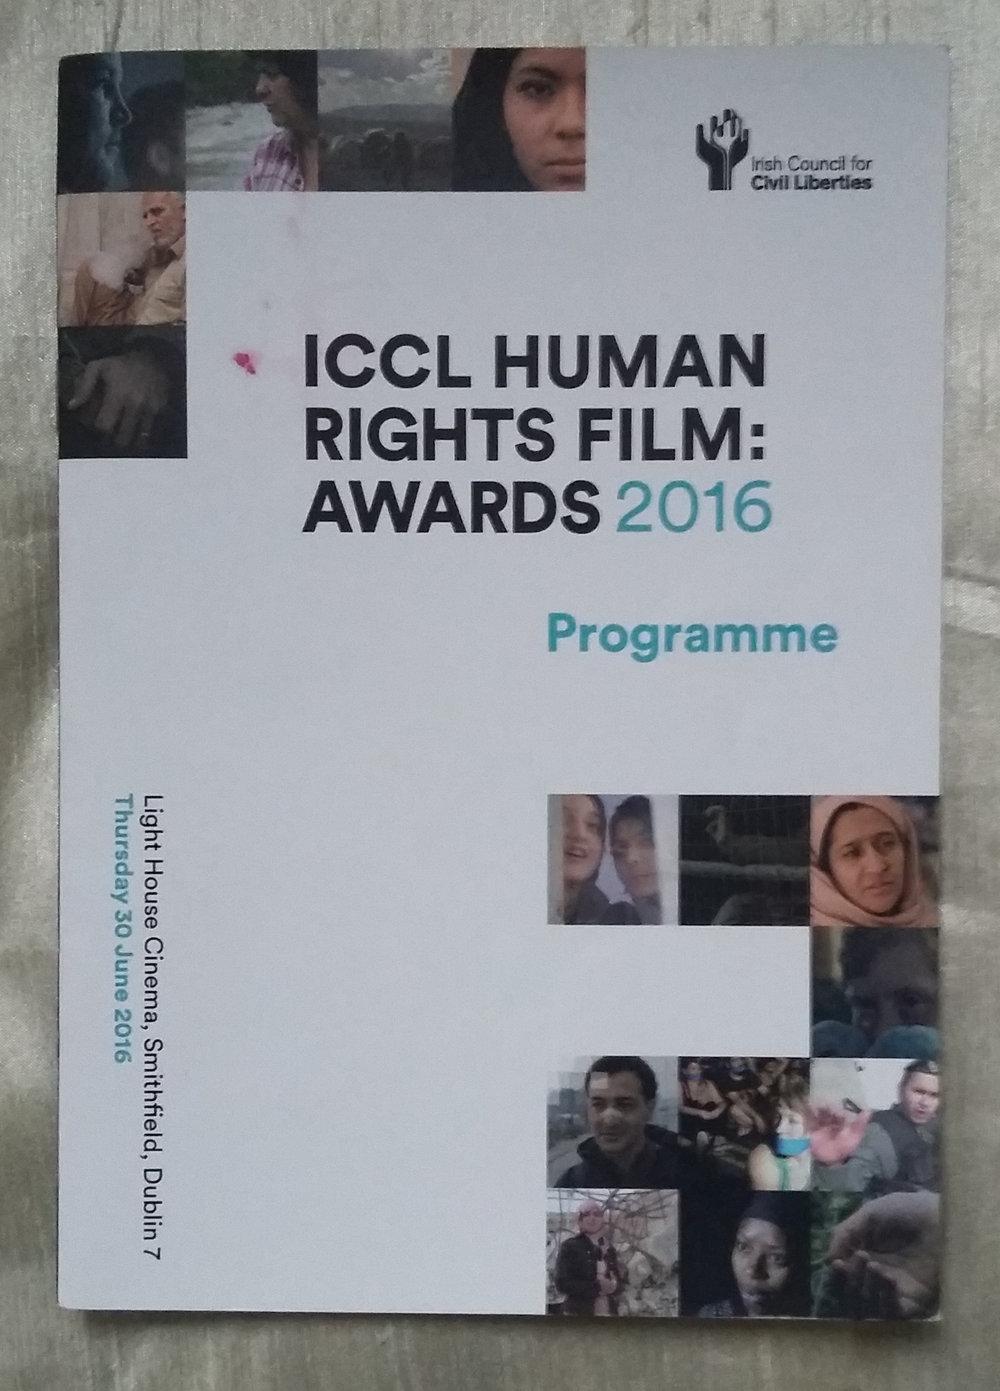 Irish Council for Civil Liberties - ICCL Human Rights Film Awards 2016 Programme